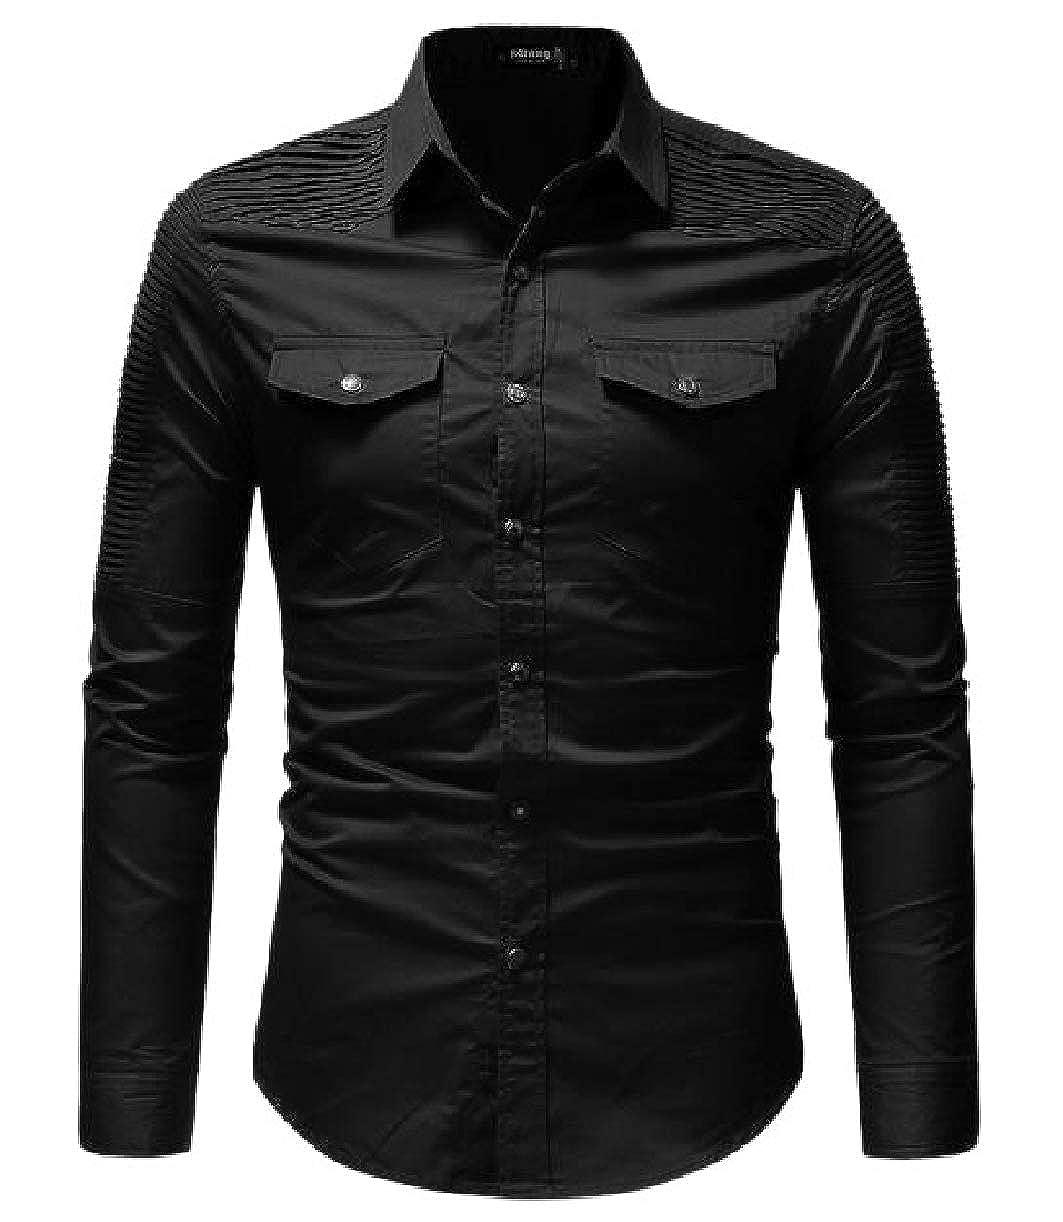 CBTLVSN Mens Casual Slim Fit Long Sleeve Work Shirt Dress Shirt Tactical Shirt